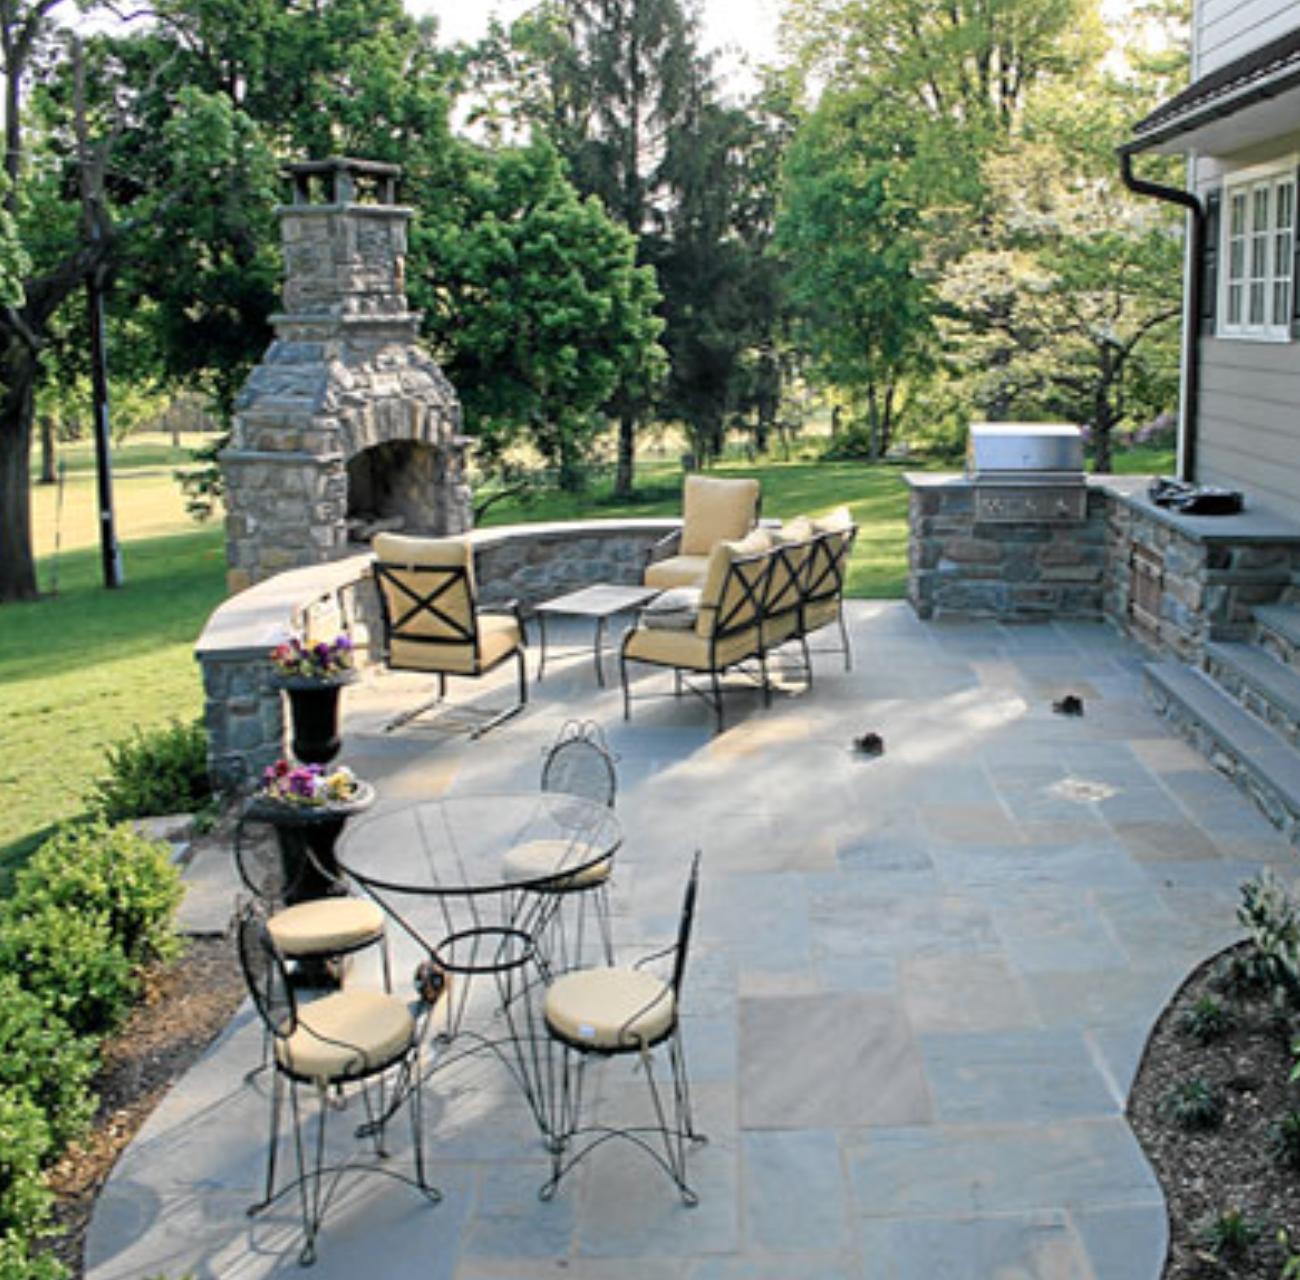 "Backyard Patio Diy: Blue Stone 1"" Variegated Patio Floor"